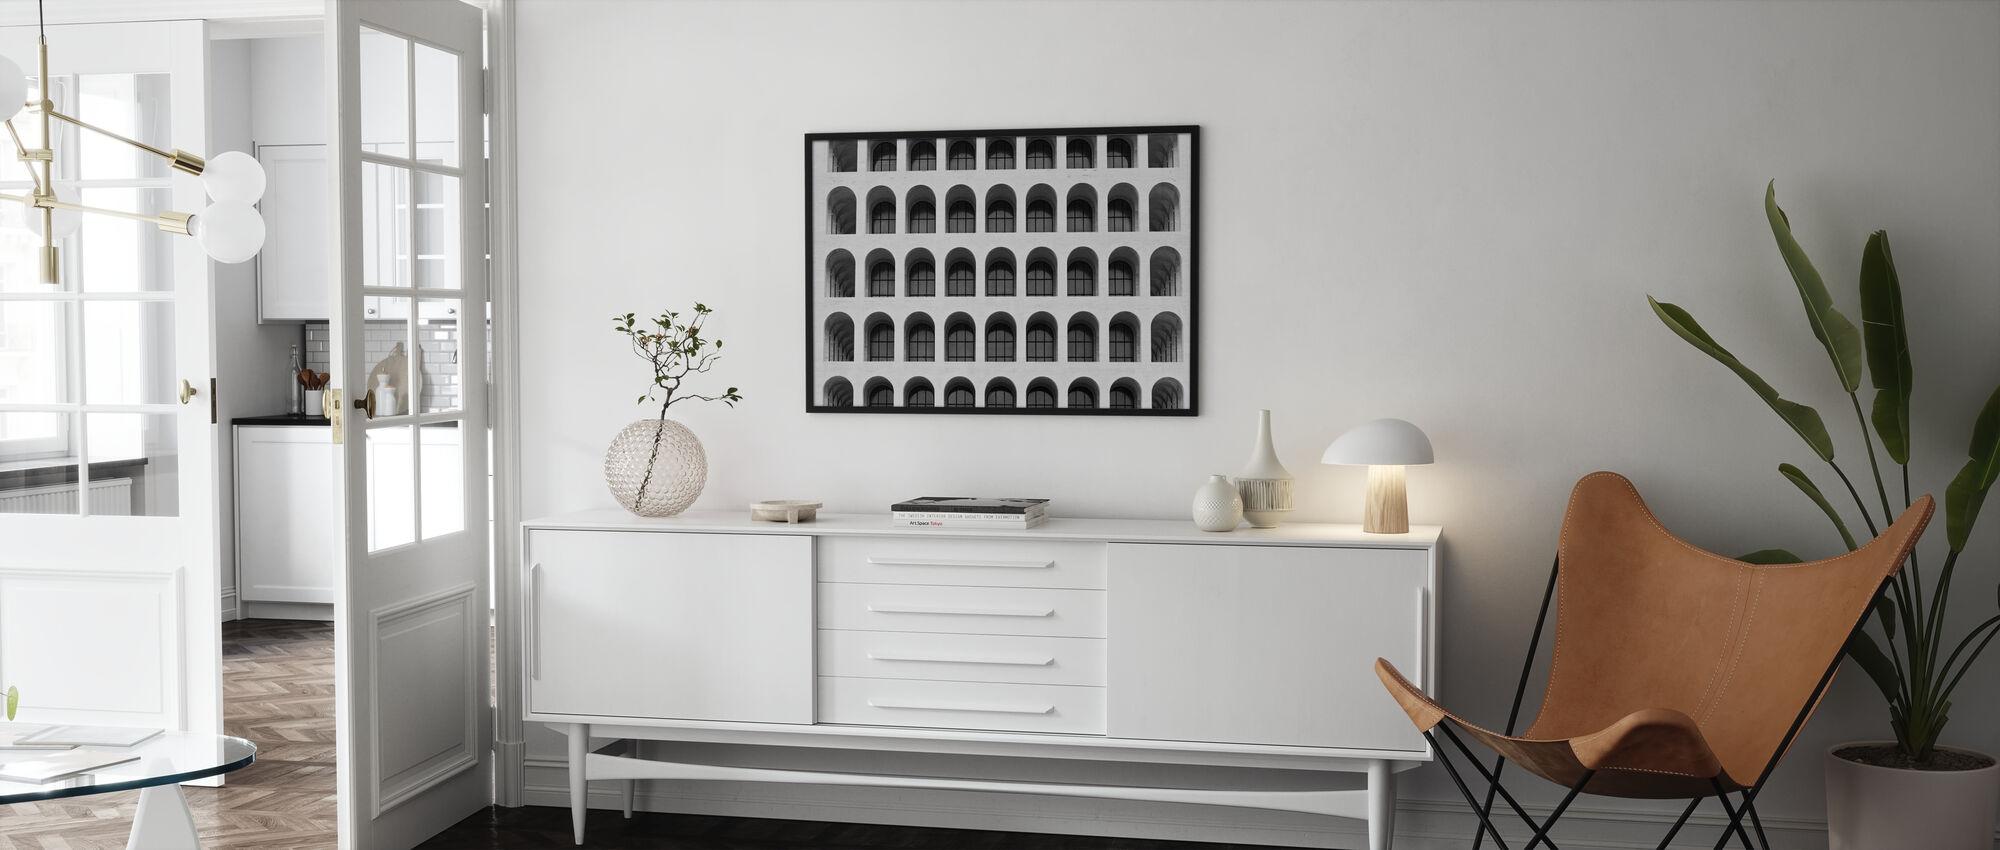 Kolosseum-Fenster - Poster - Wohnzimmer